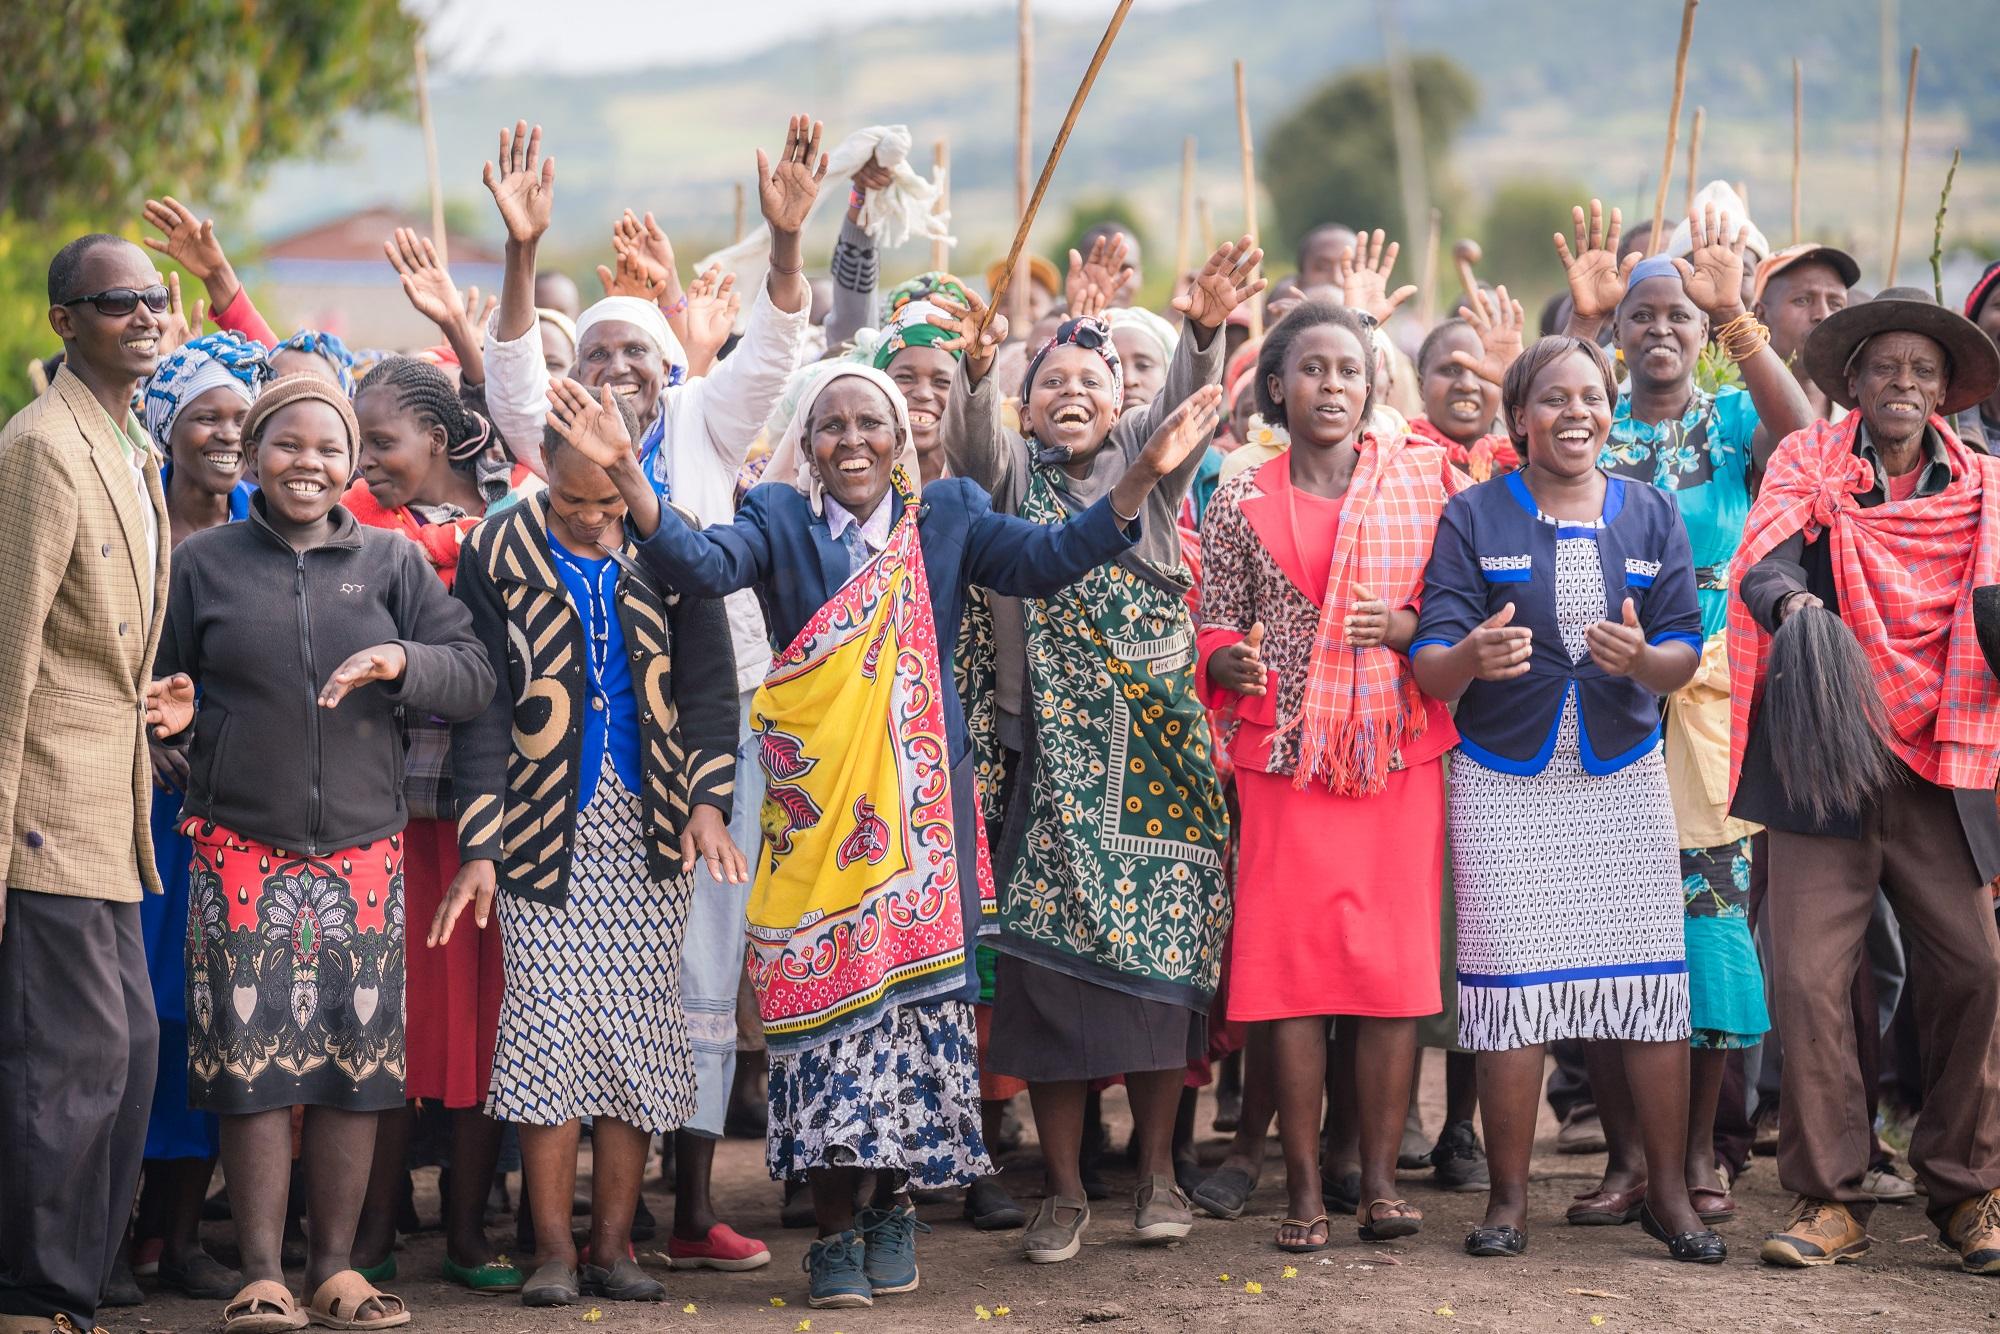 Community Members in Kenya